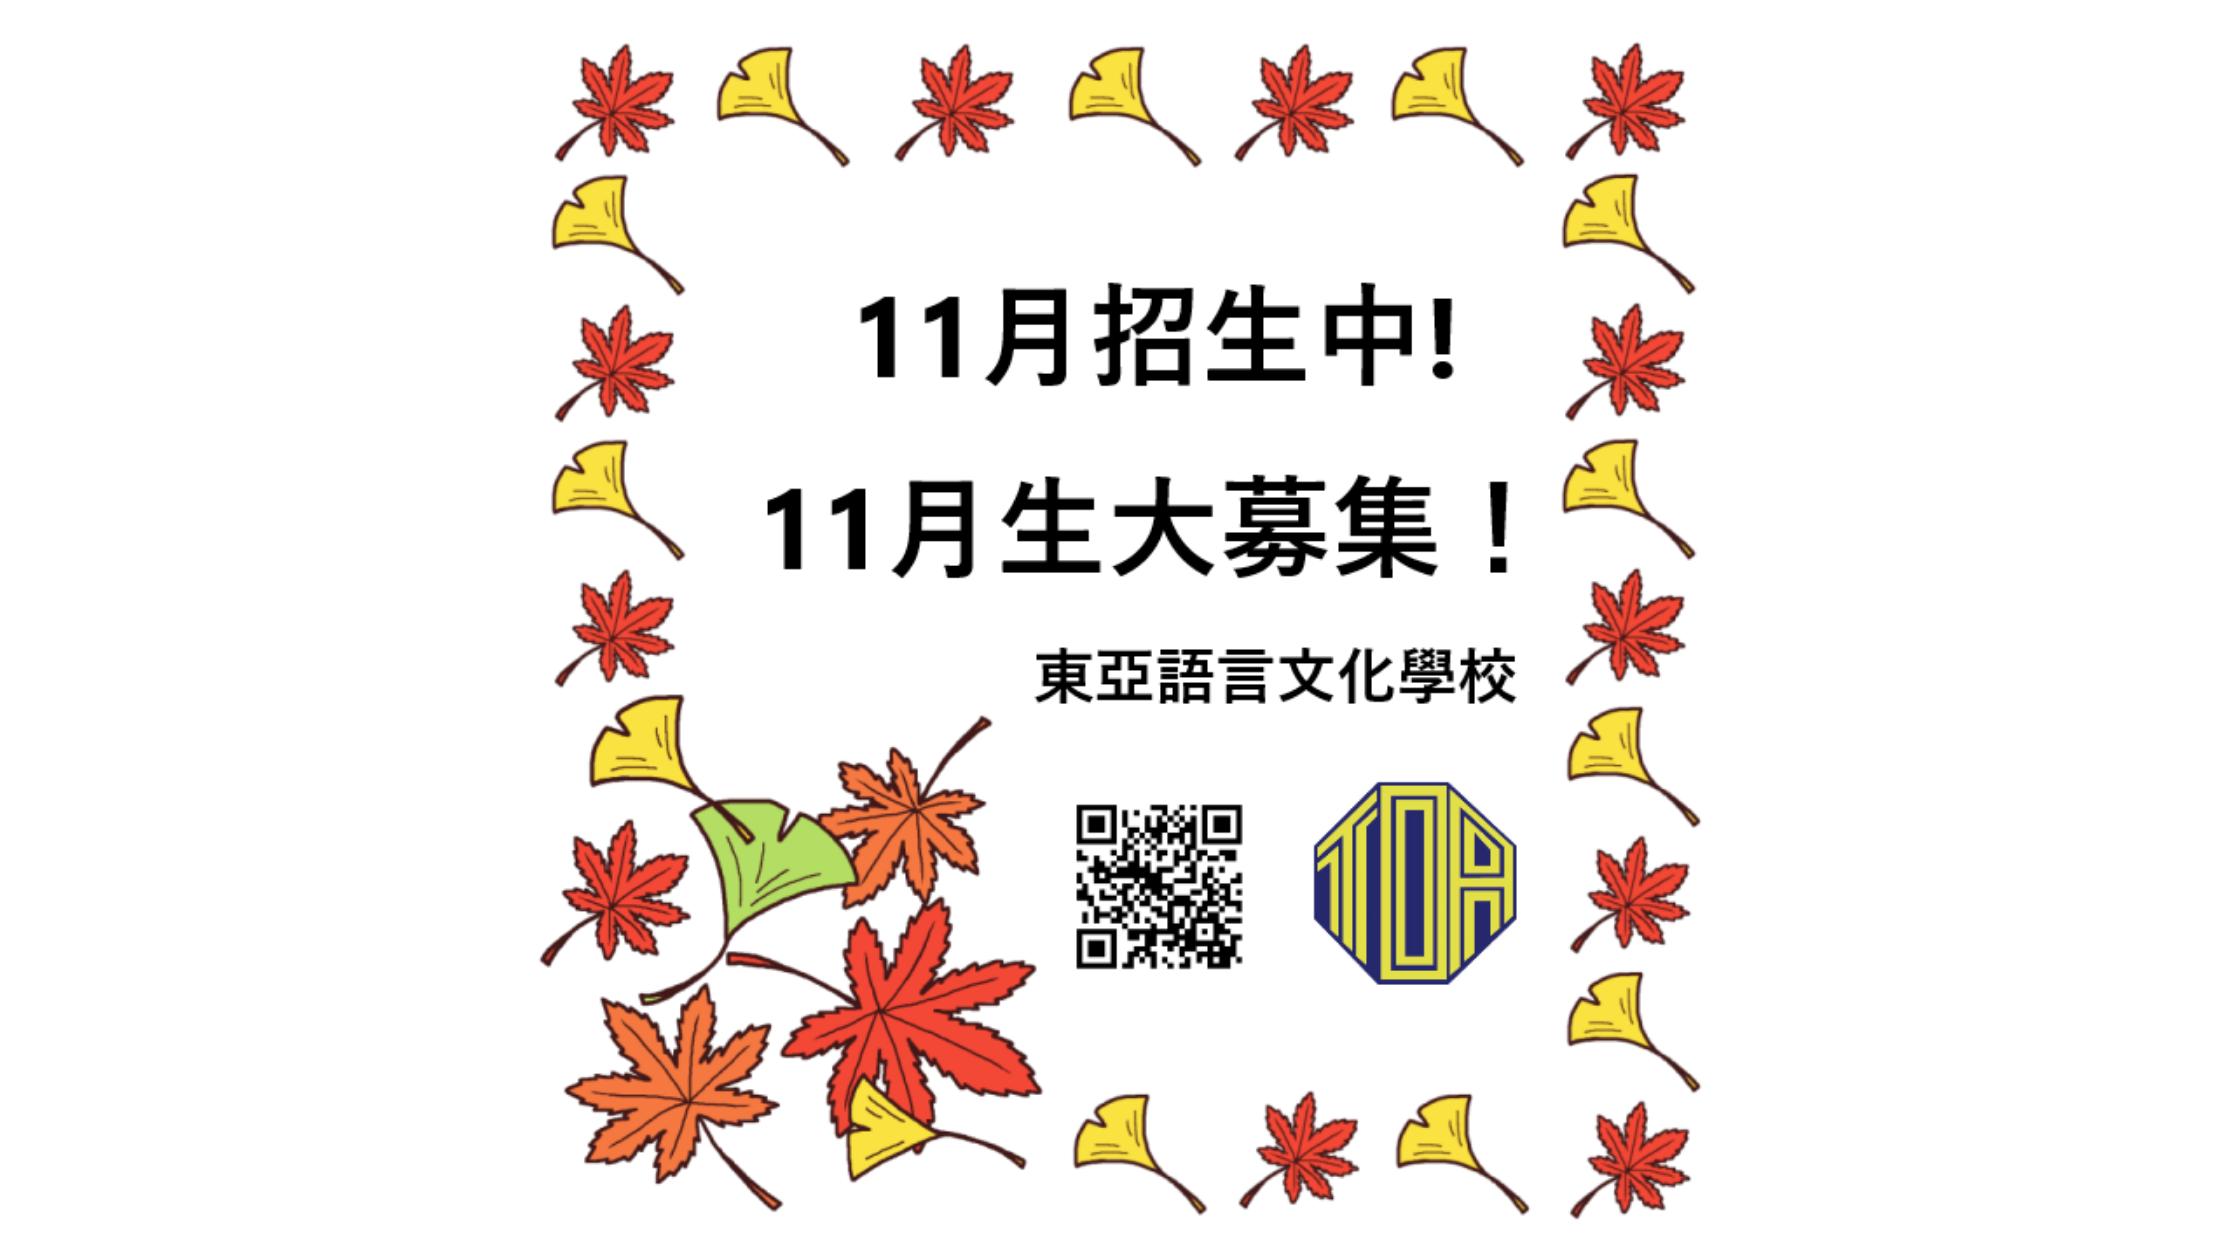 hongkong toa japanese school cantonese chinese summer courses 香港 東亞 日文 日本語 広東語 北京語 中国語